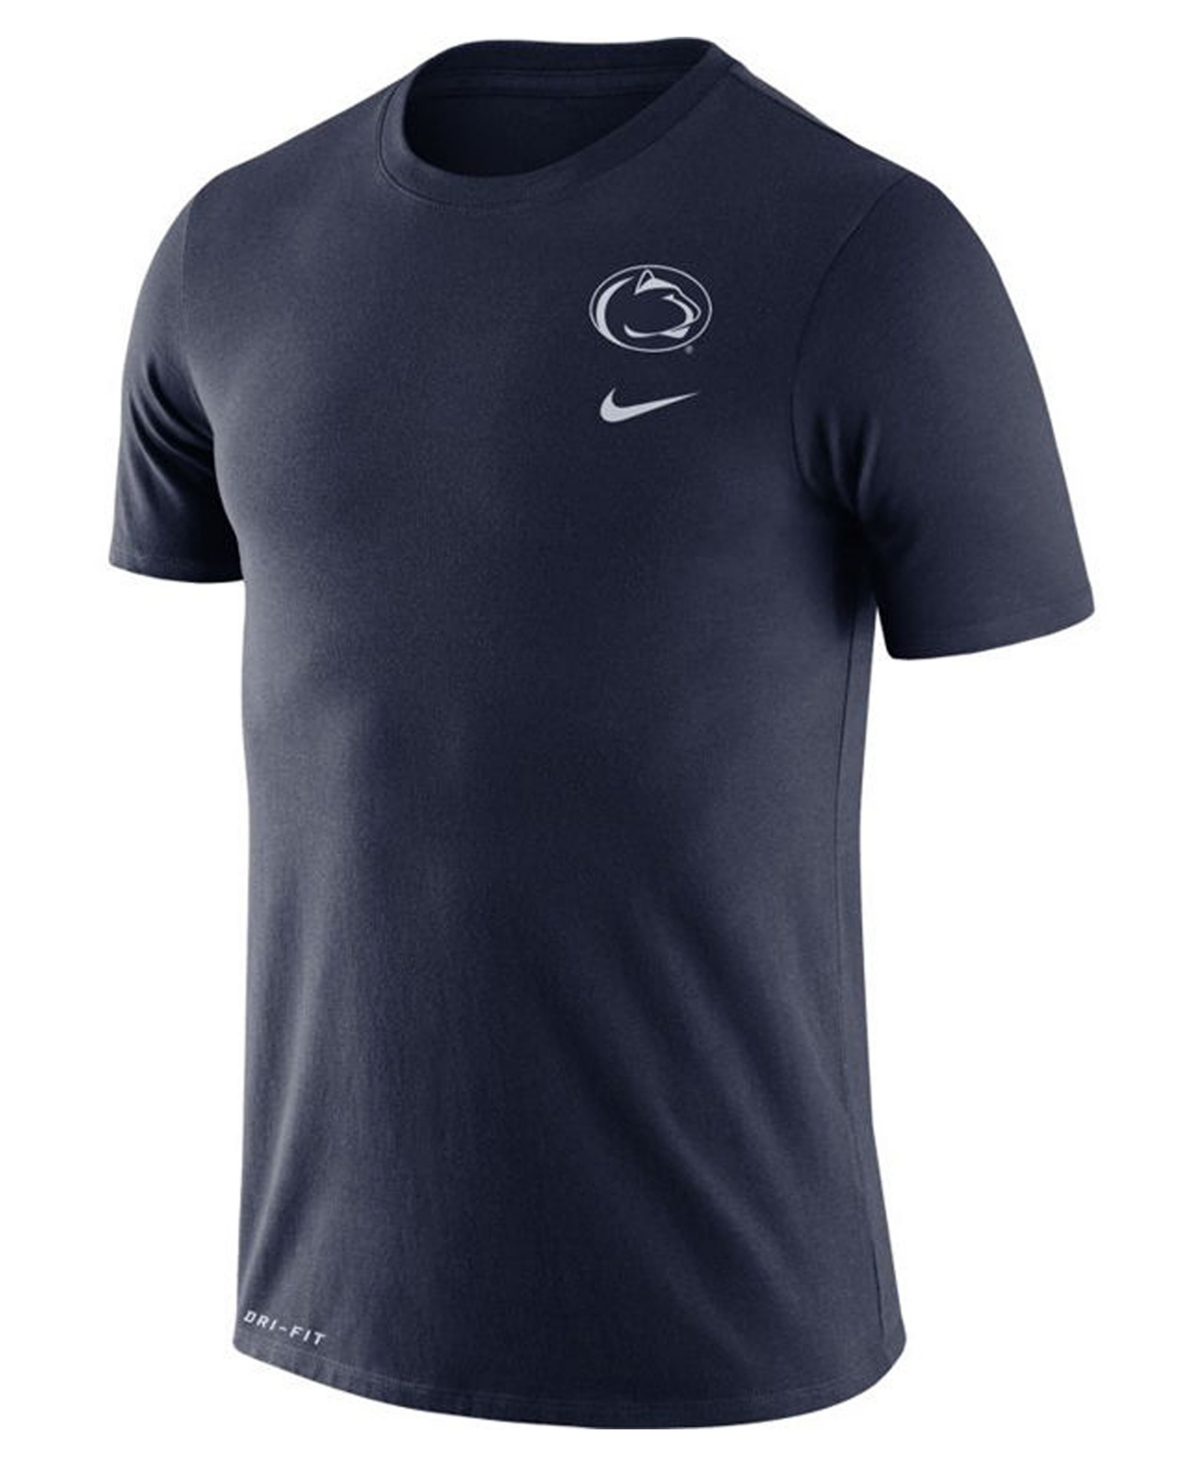 Nike Penn State Nittany Lions Mens Dri-Fit Cotton Dna T-Shirt